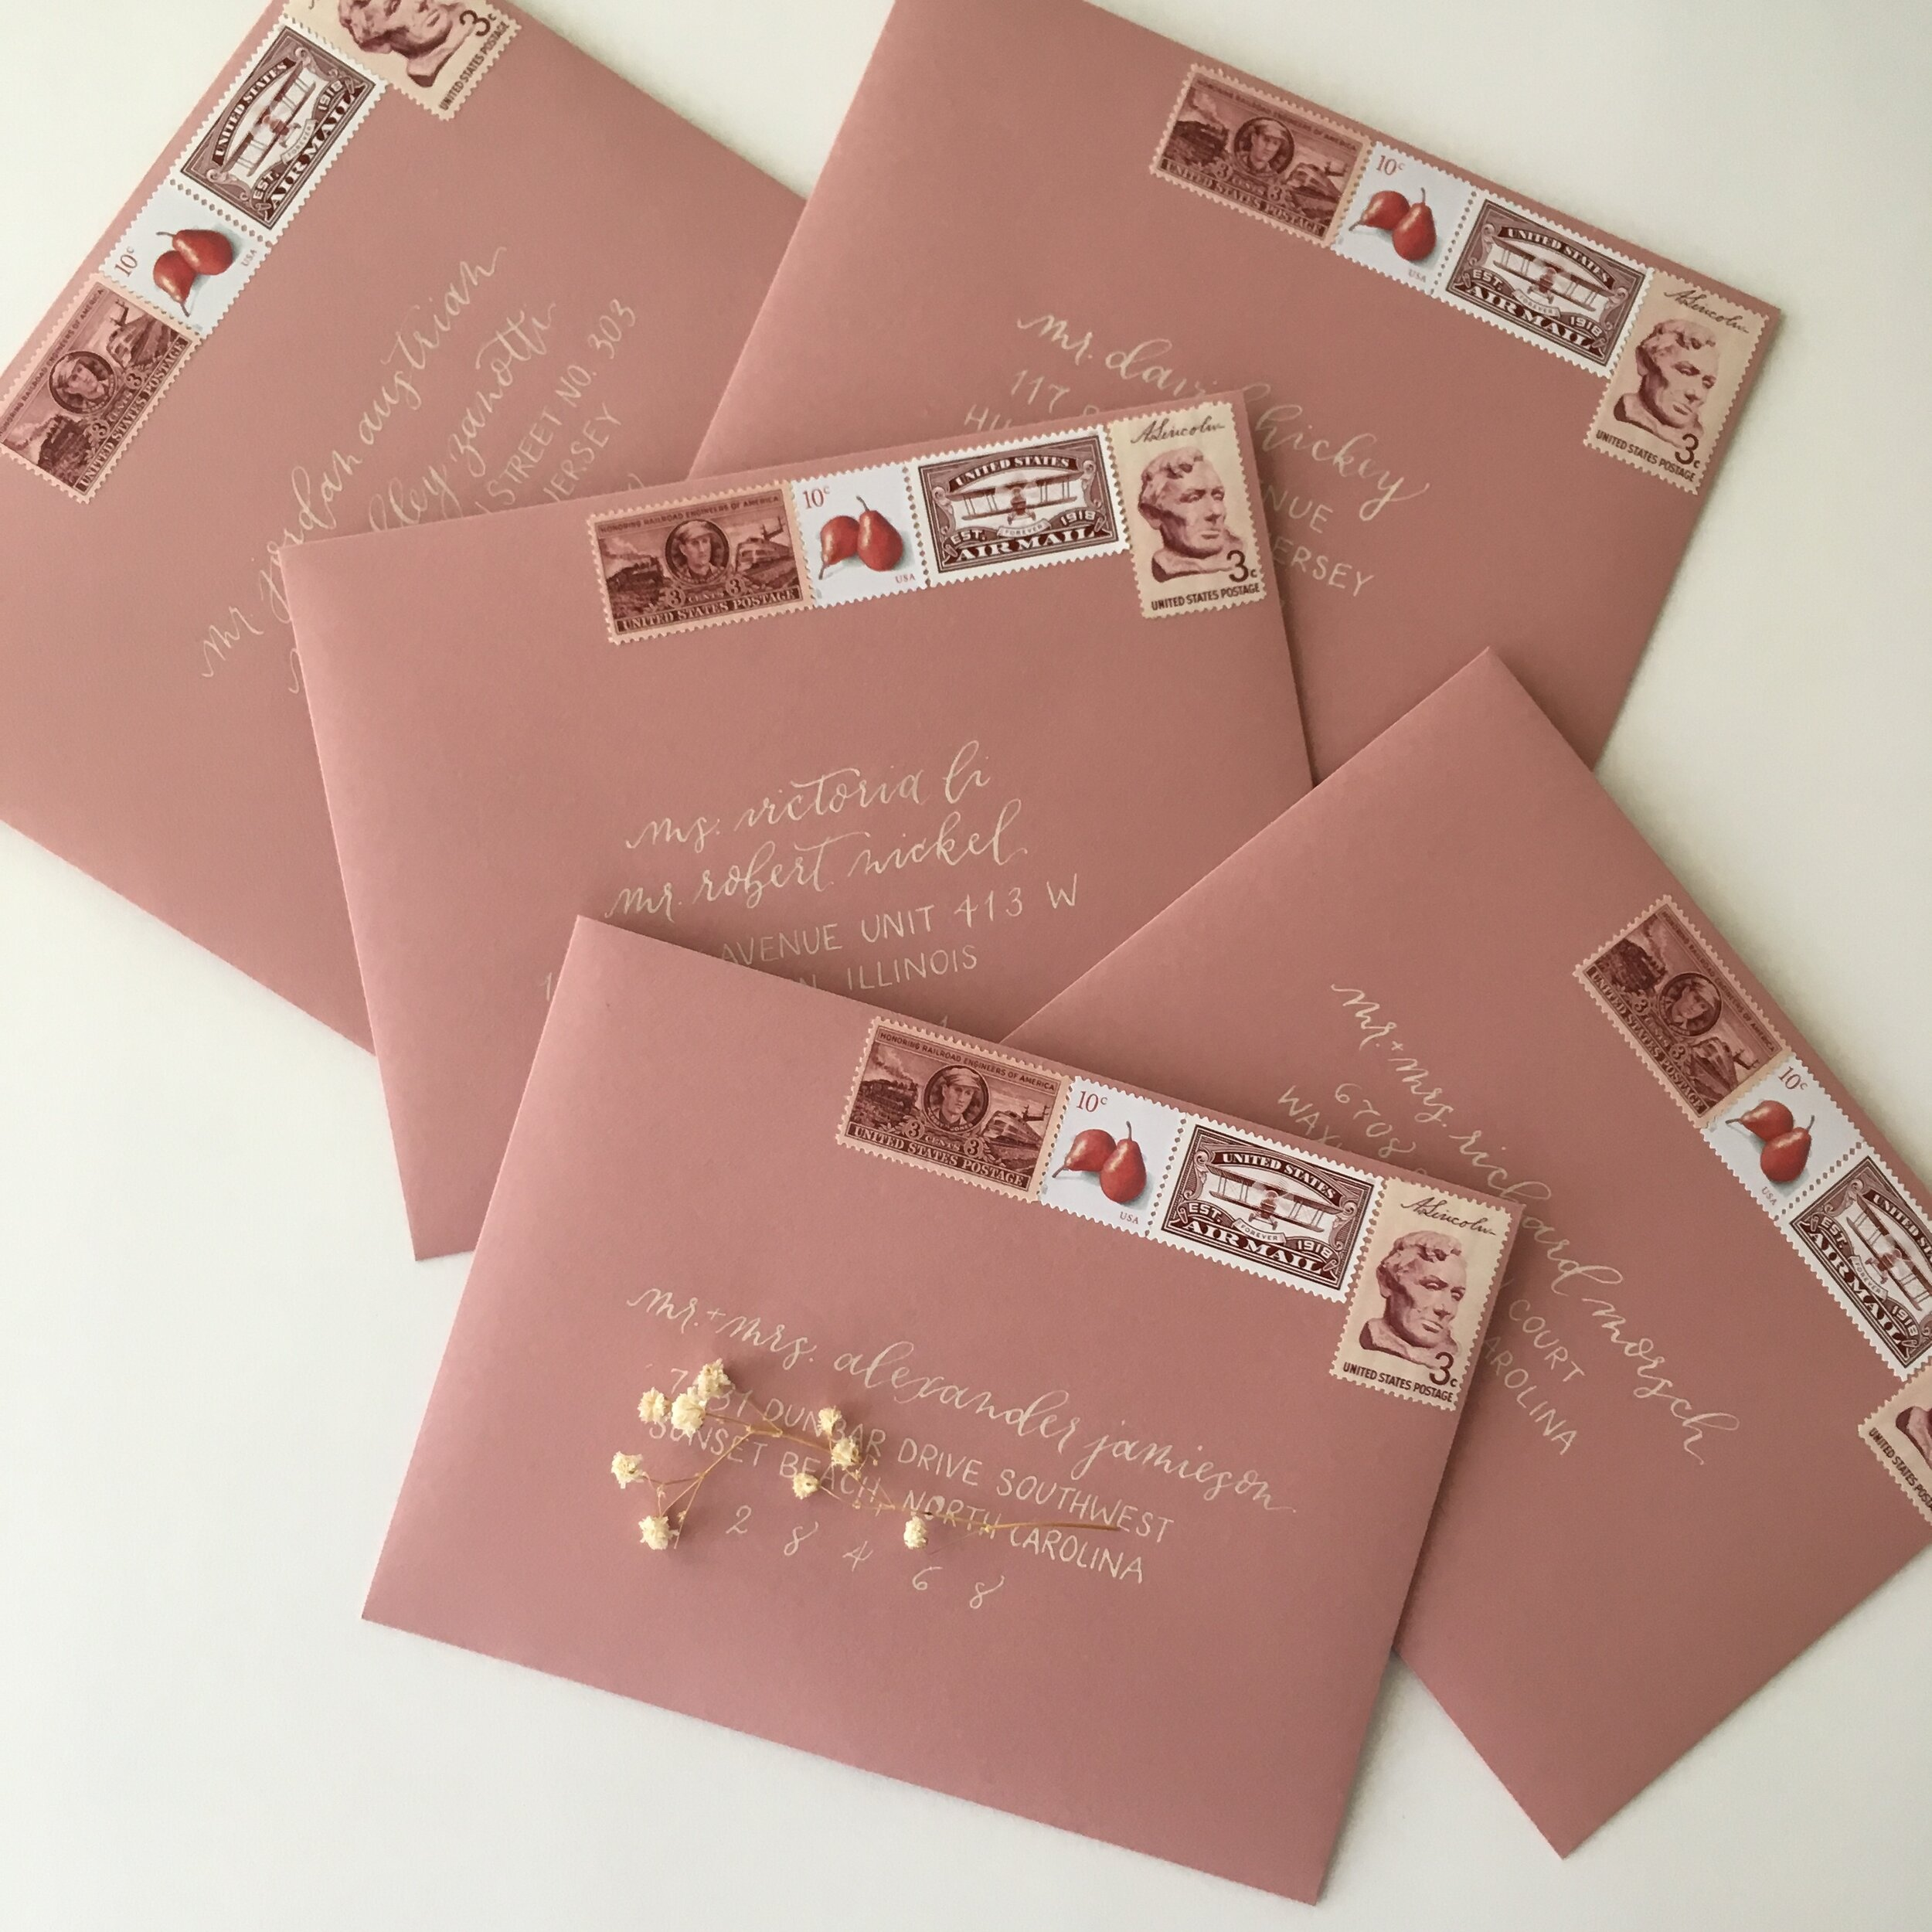 Raleigh Calligraphy & Design Custom Wedding Invitations